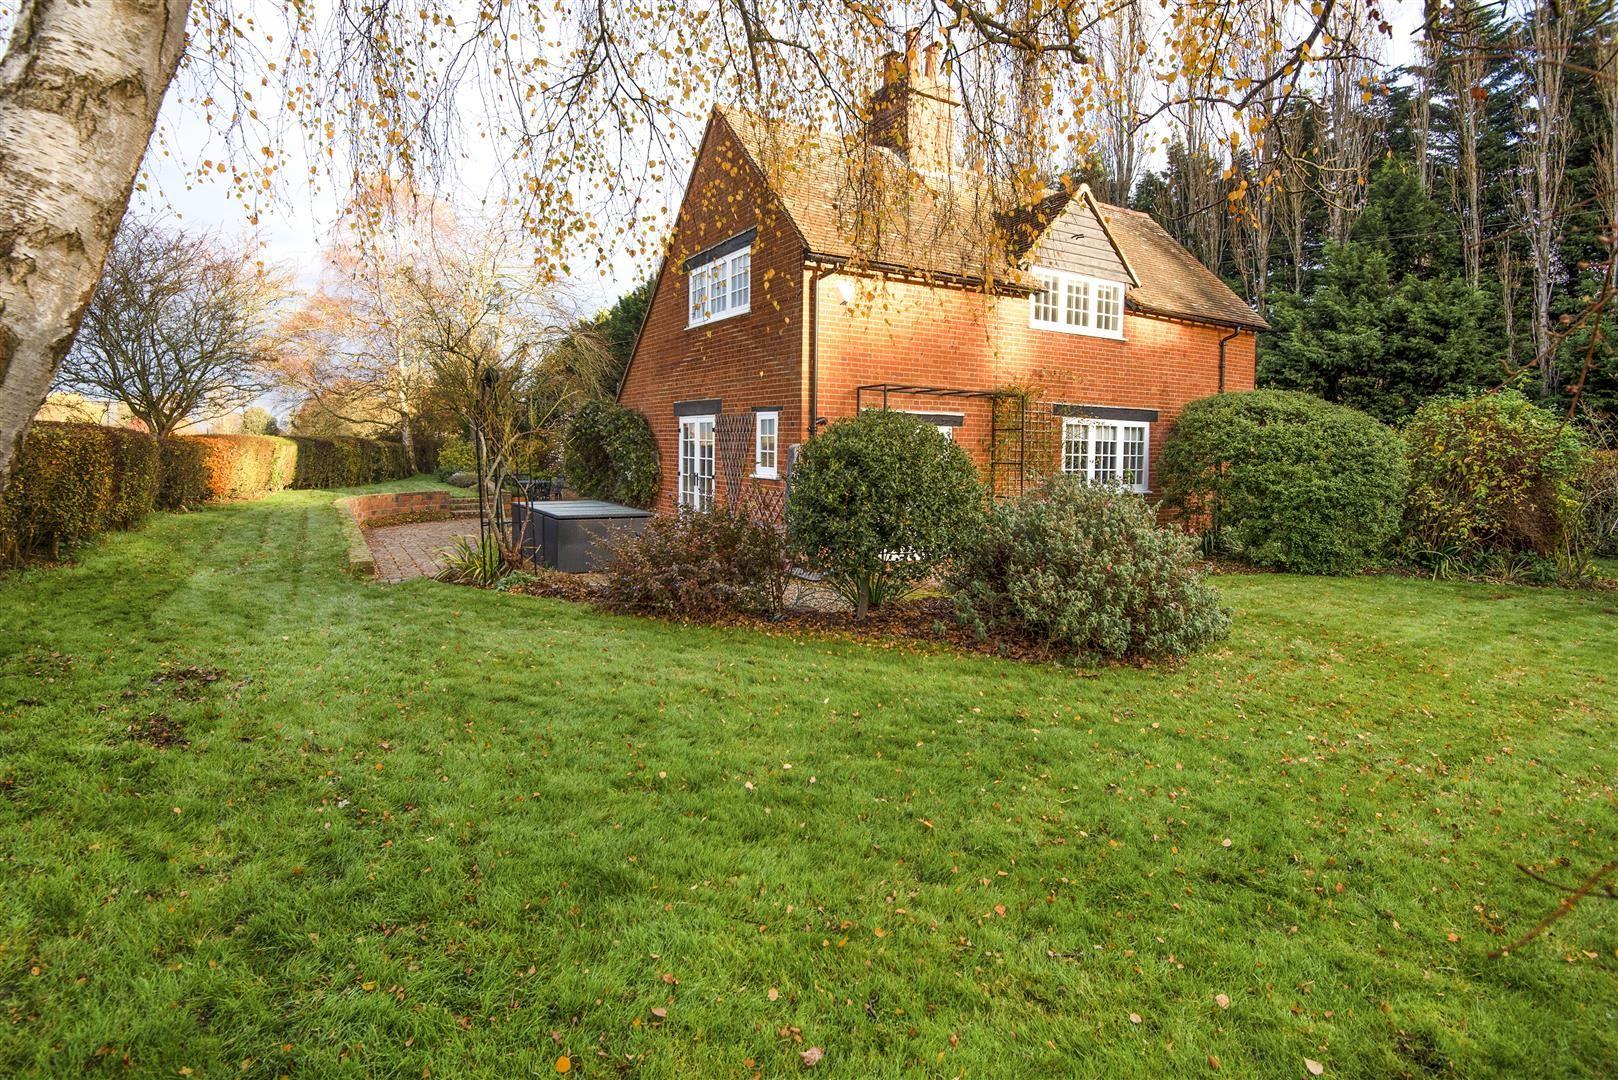 Property photo 1 of 28. 672115 (10).Jpg